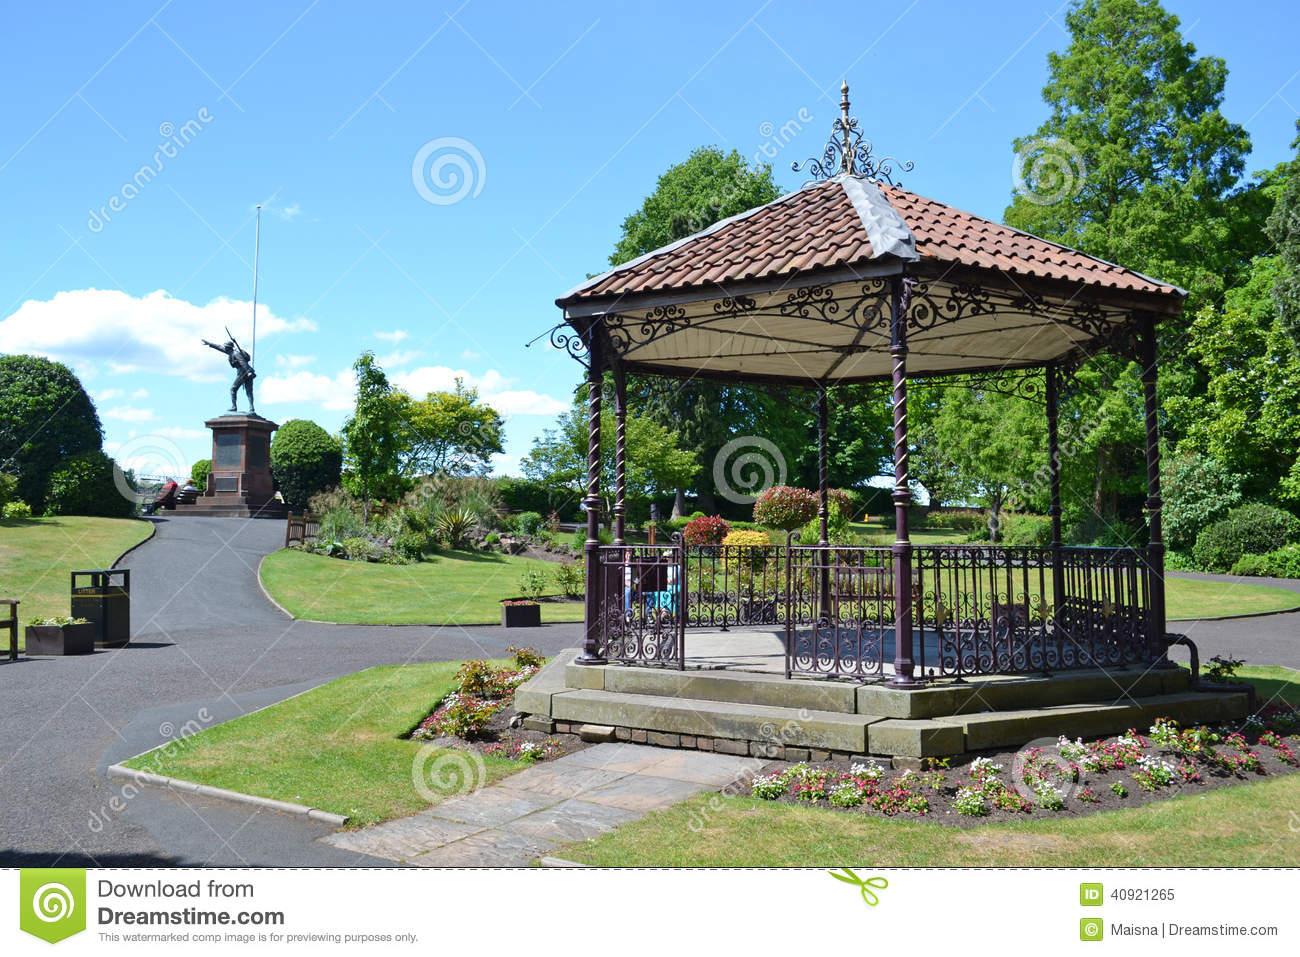 Bridgnorth Bandstand Stock Photo.